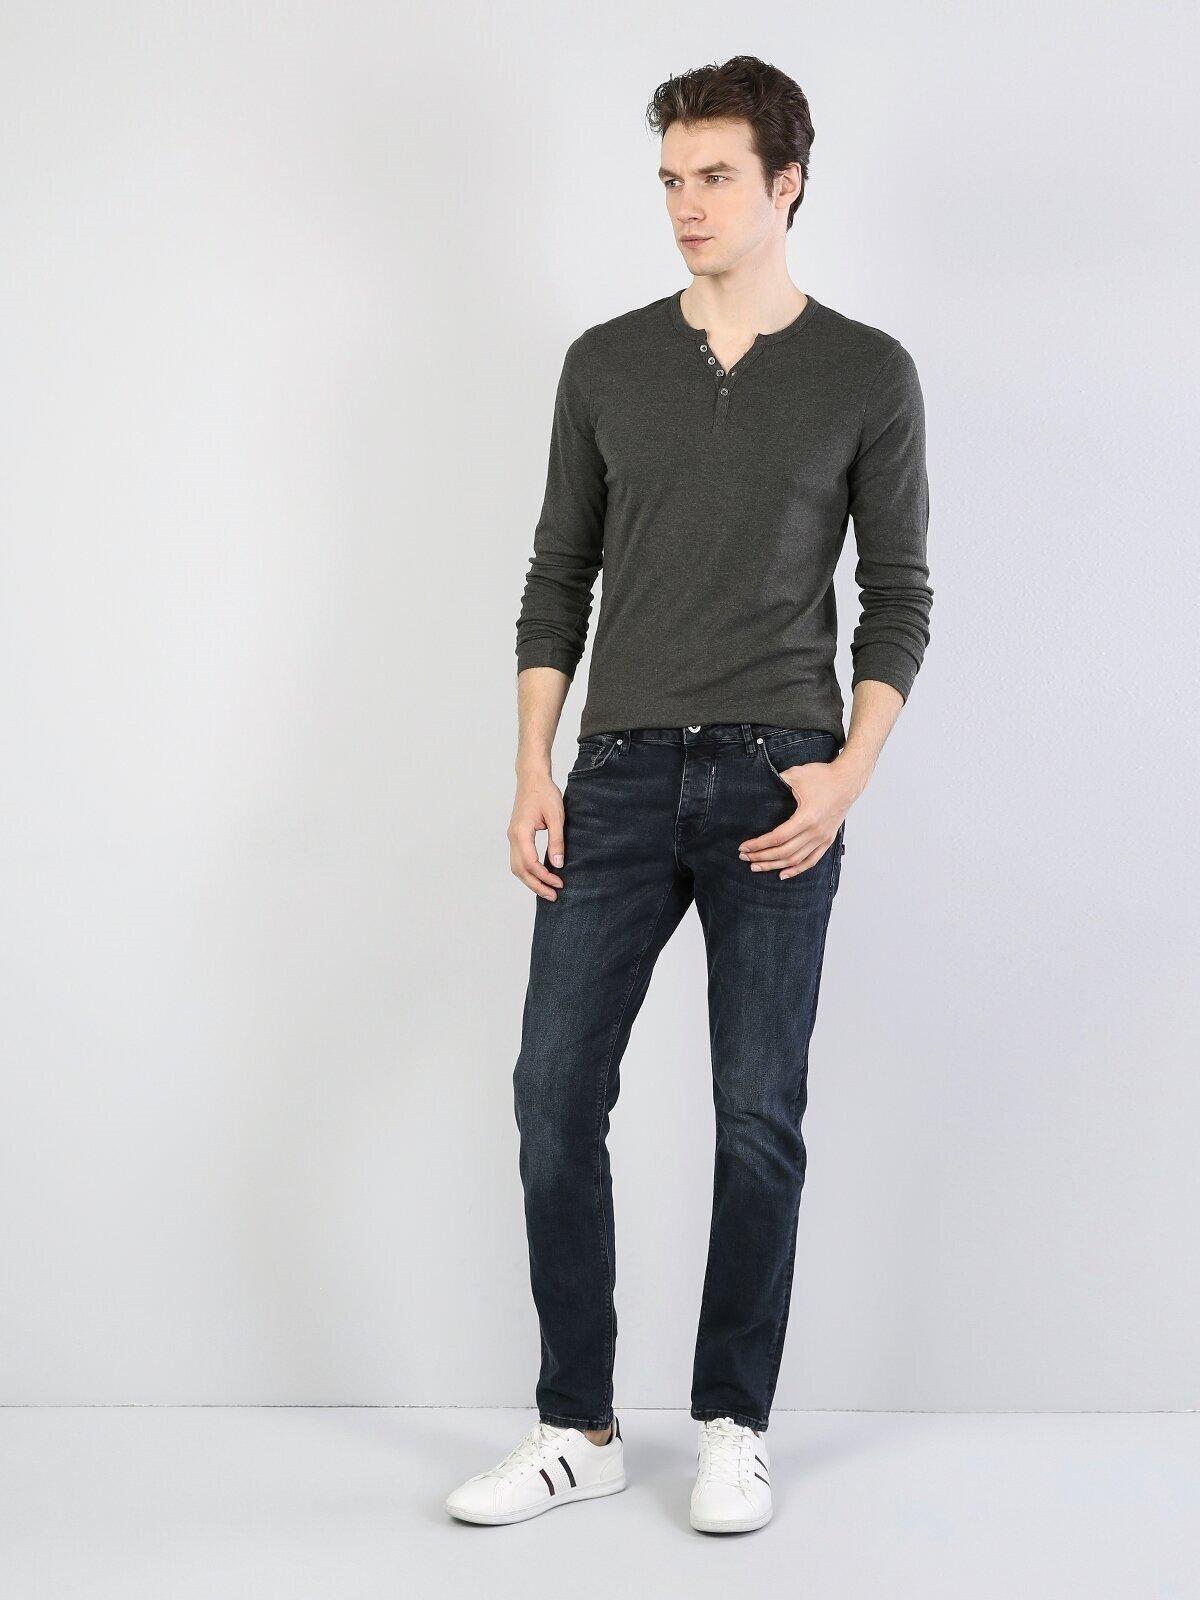 Slim Fit Placket Neck Erkek Haki Tshirt U.Kol